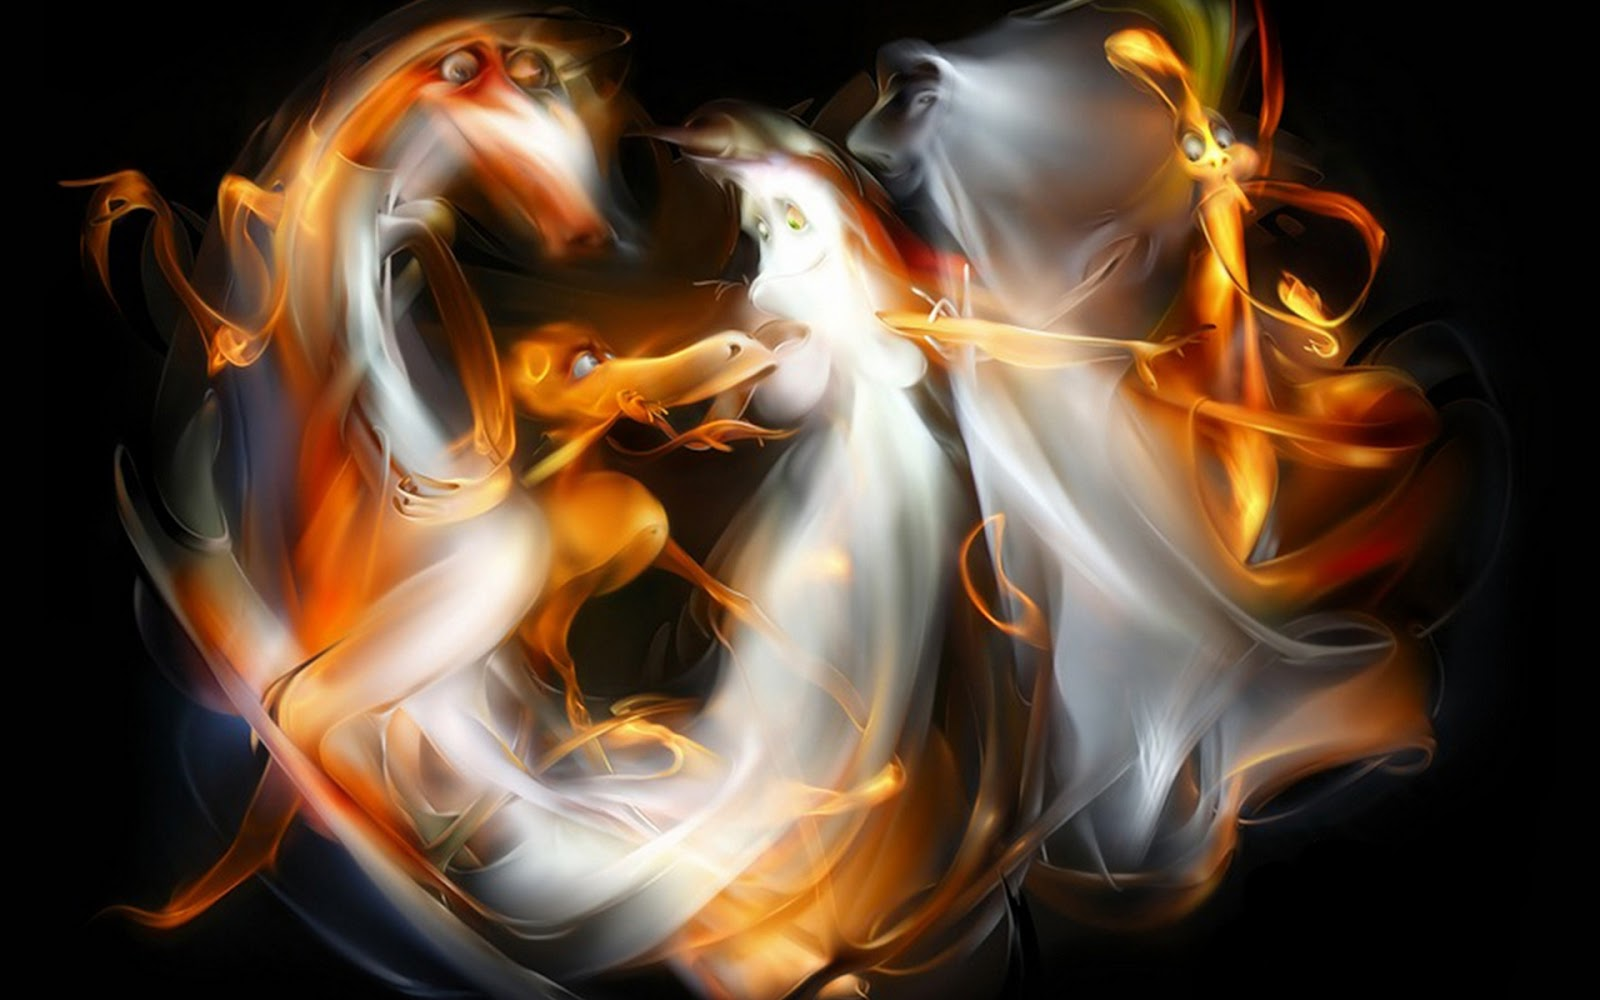 S Hd Image Wallpaper: Shine HD Wallpapers: Surreal-Wallpapers-HD